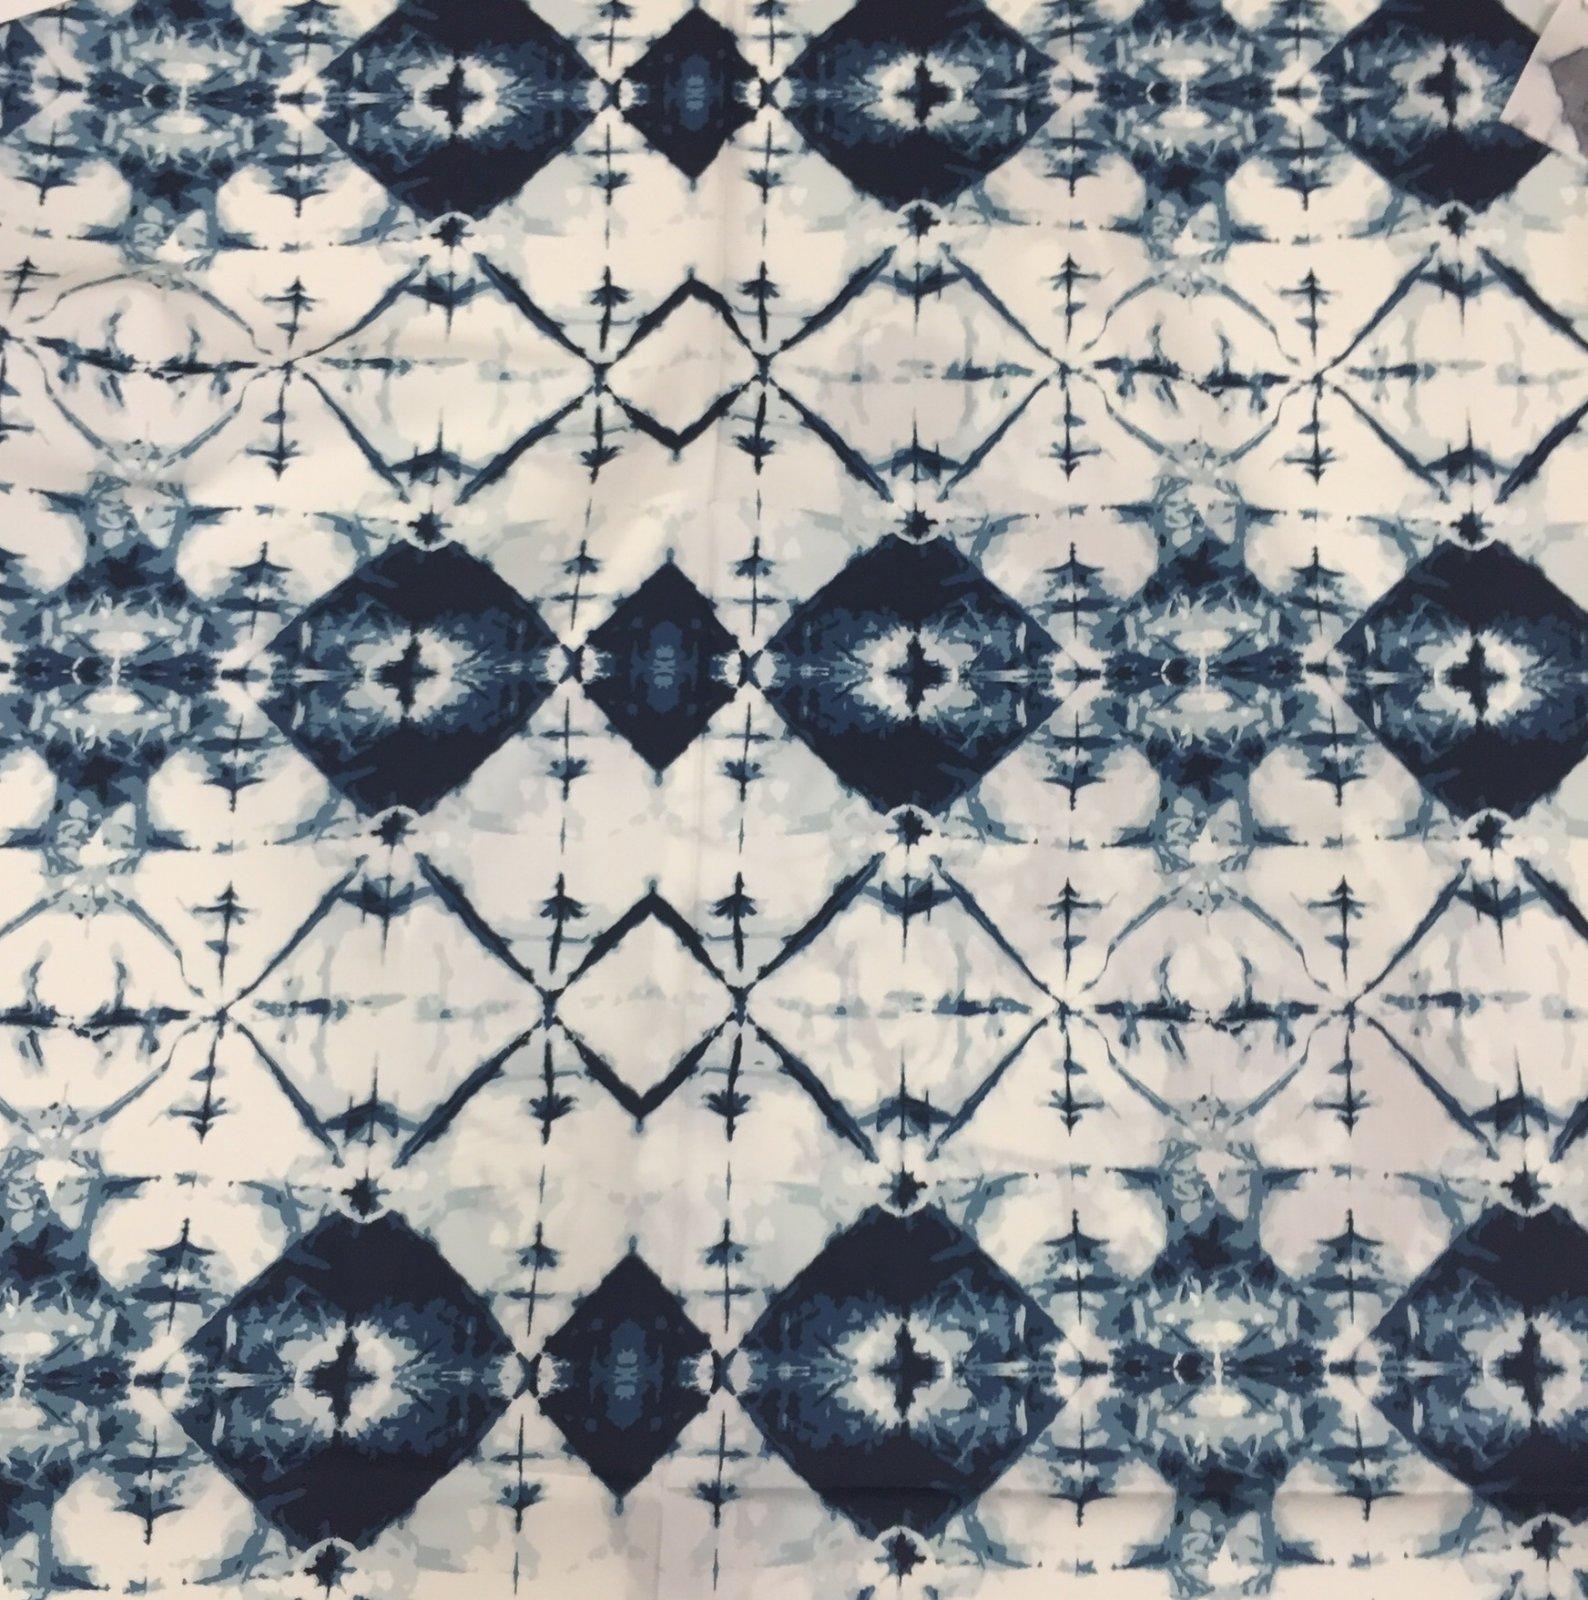 Observer April Rhodes Retro Ink Blot Indigo Tie Dye Cotton Quilt Fabric AR47